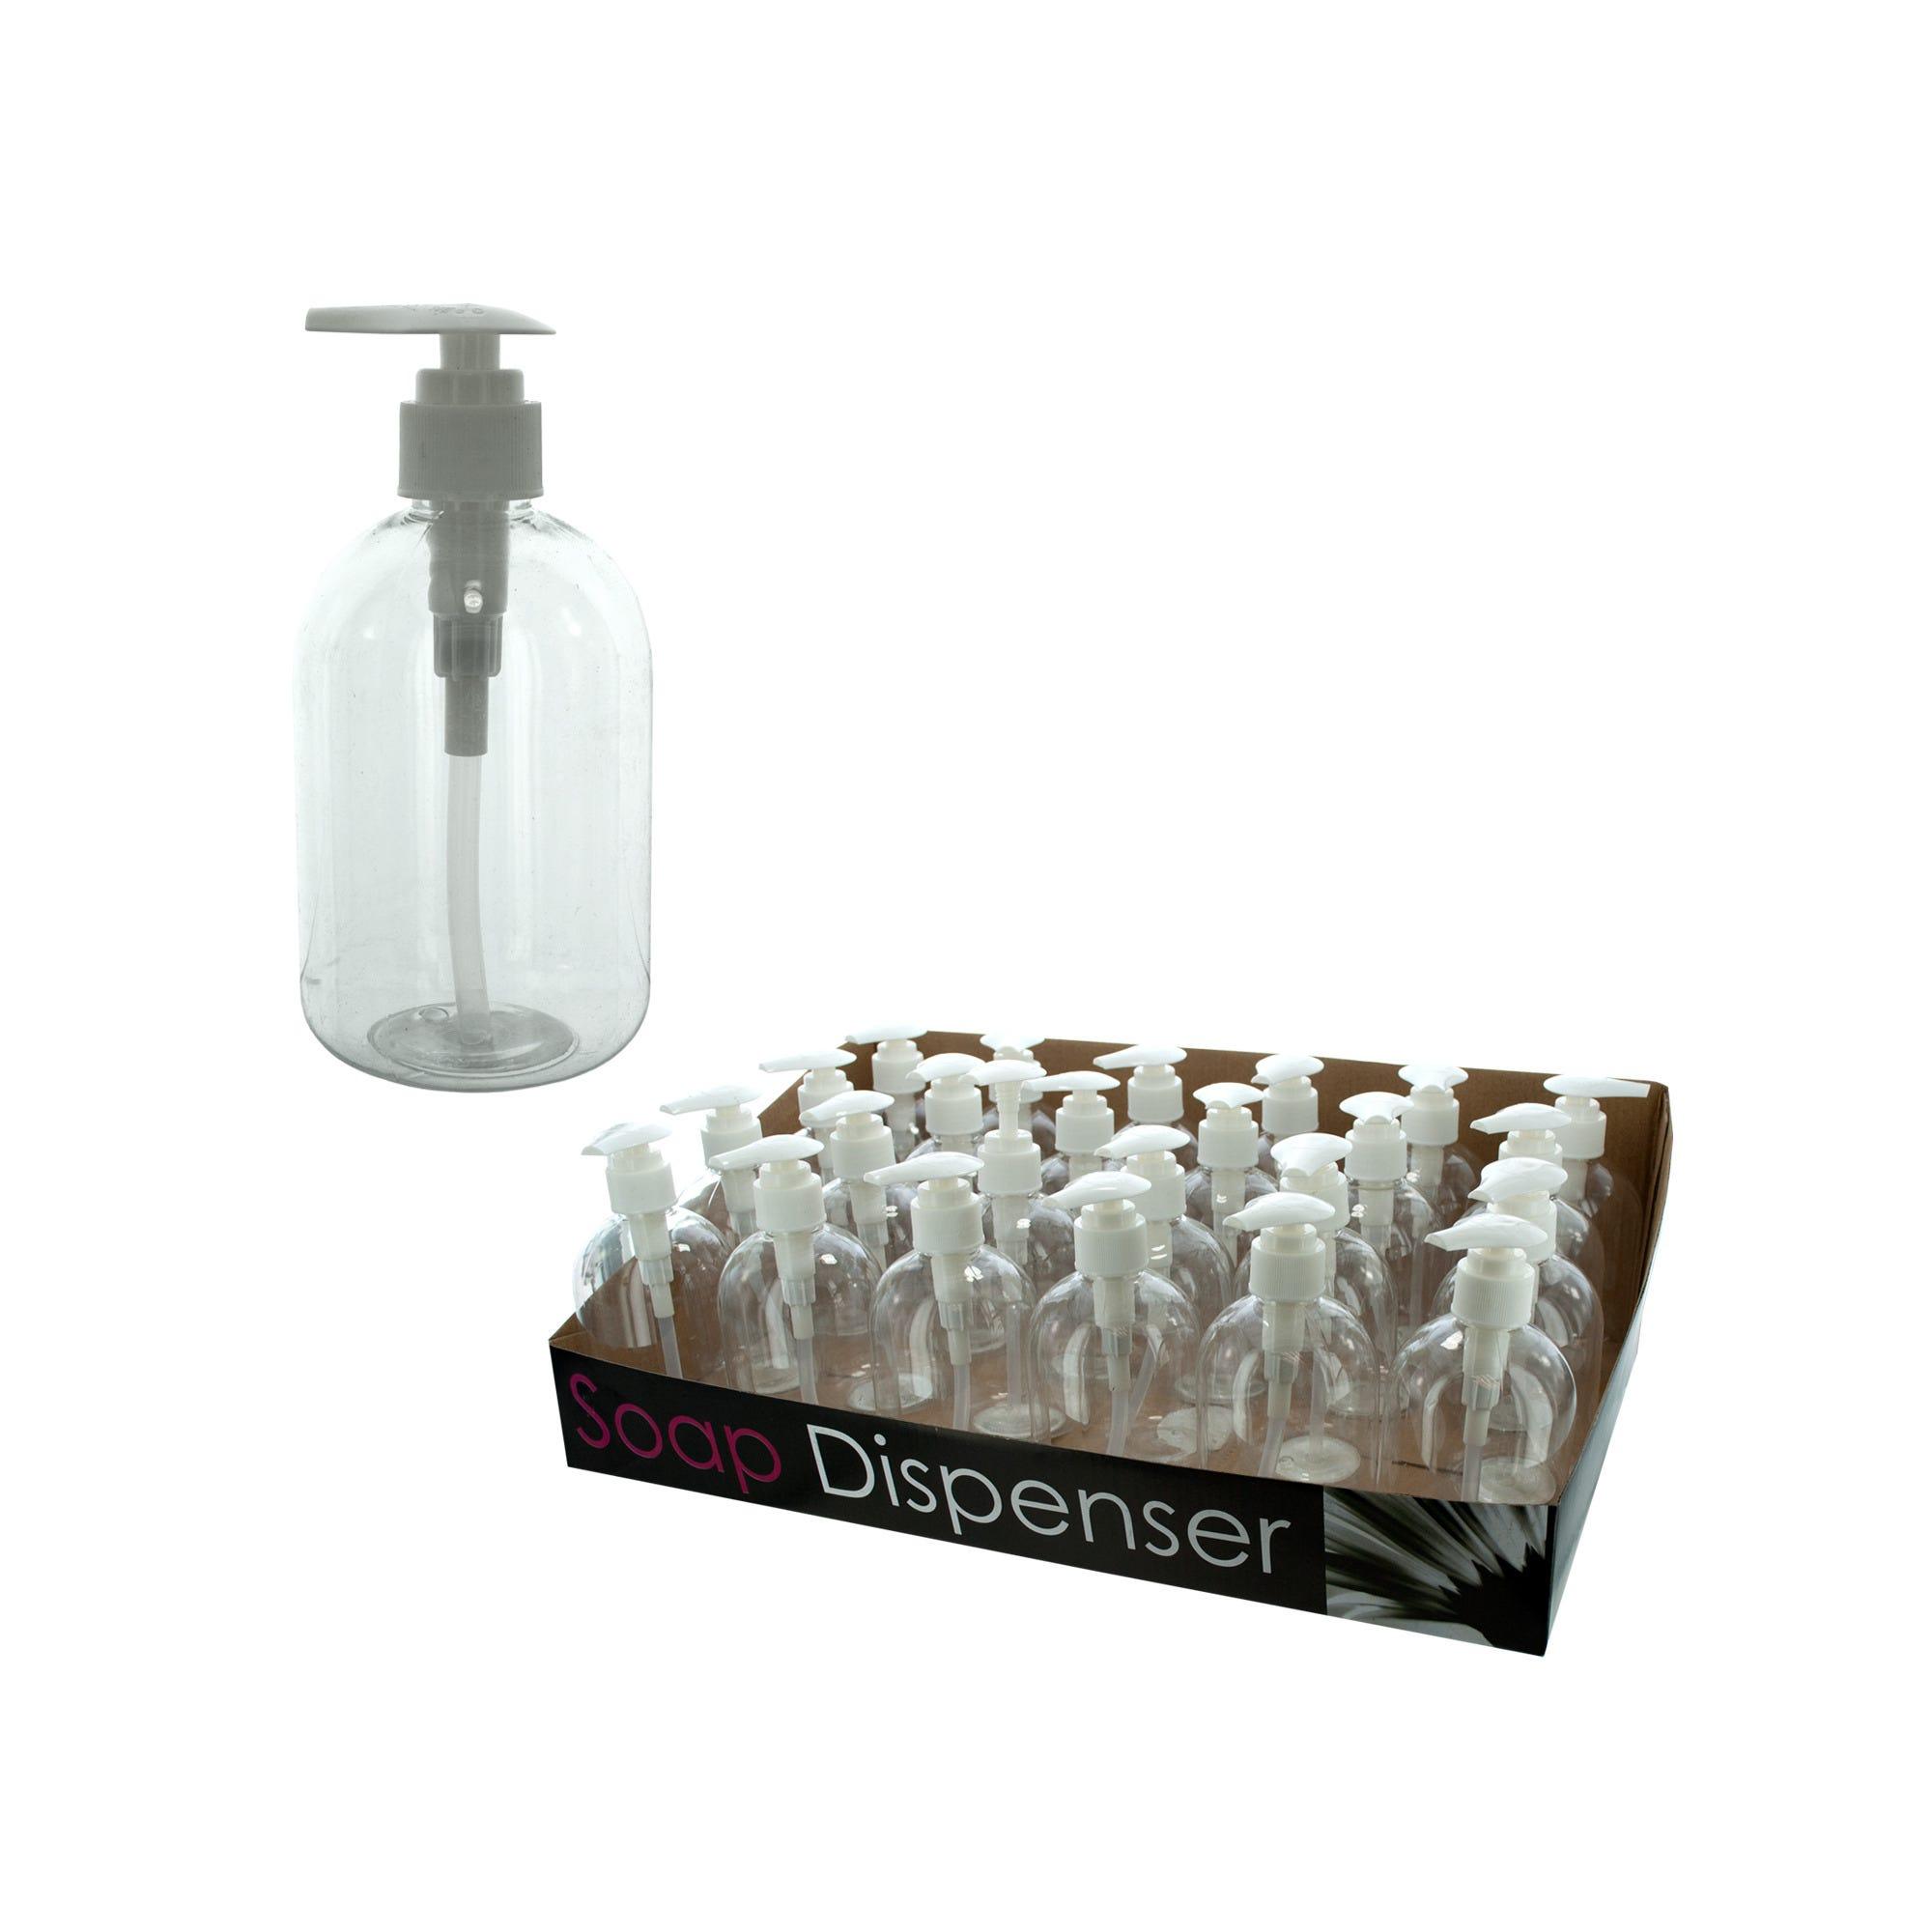 10 oz. SOAP Dispenser Bottle Countertop Display- Qty 24